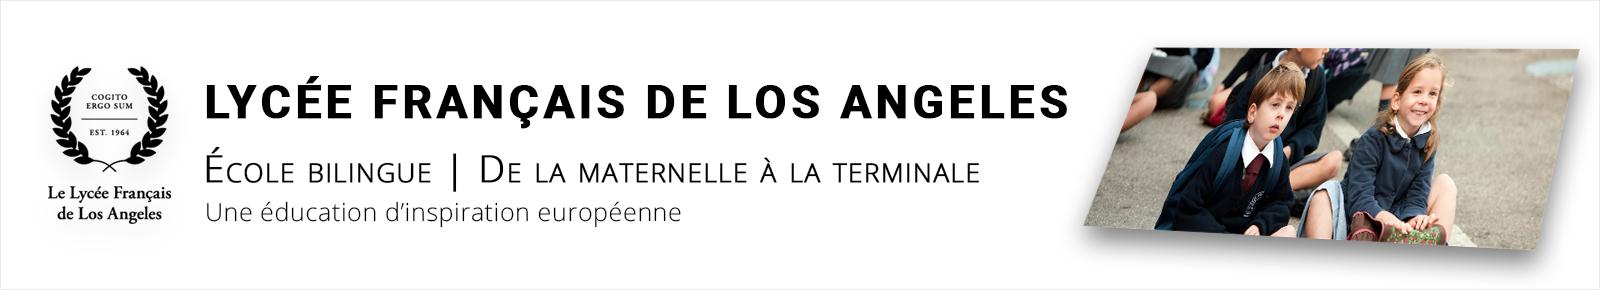 Lycée Français de Los Angeles